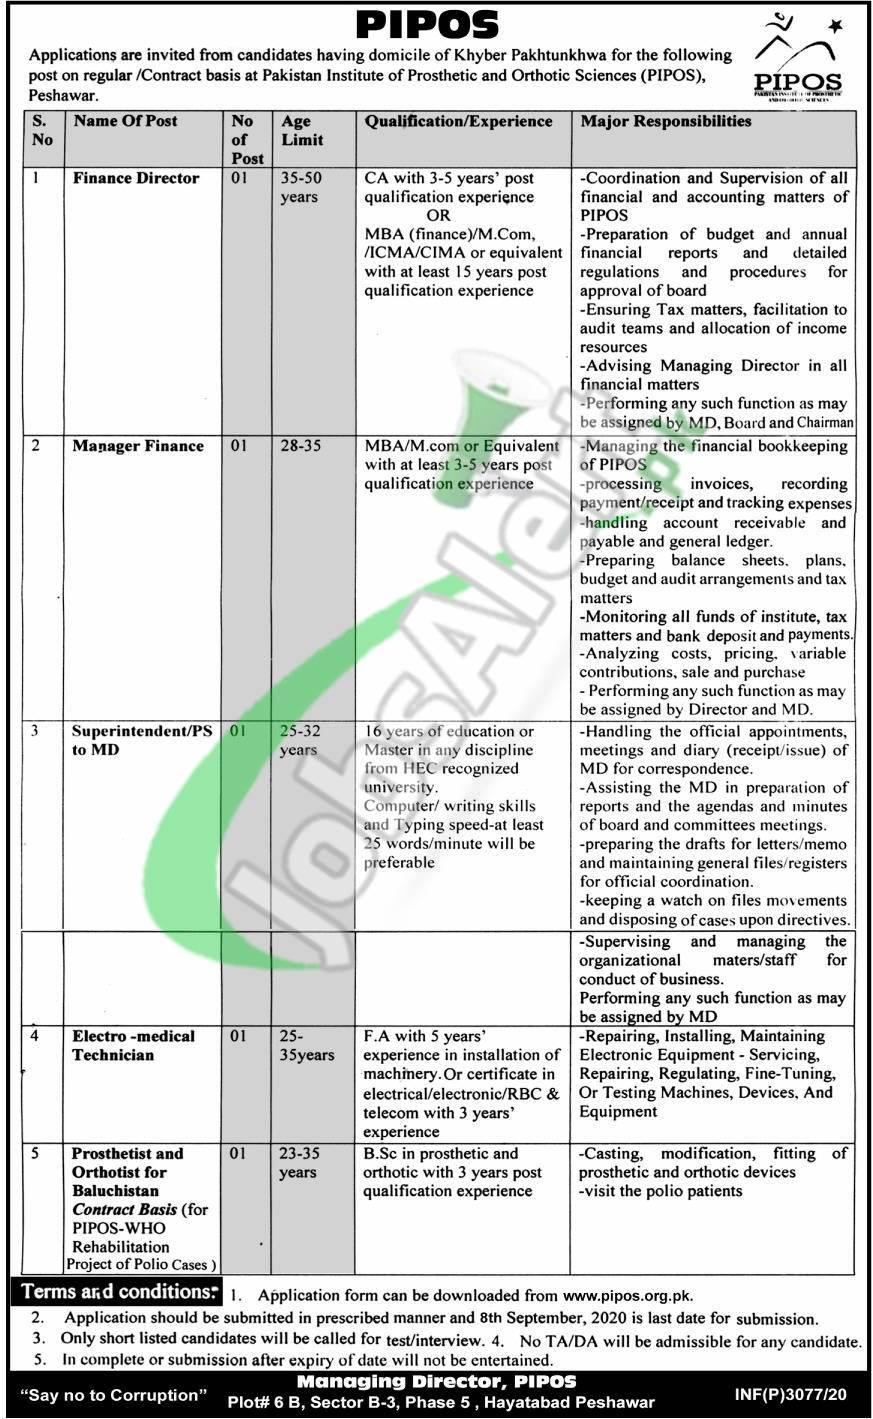 Pakistan Institute of Prosthetic & Orthotic Sciences Peshawar Jobs